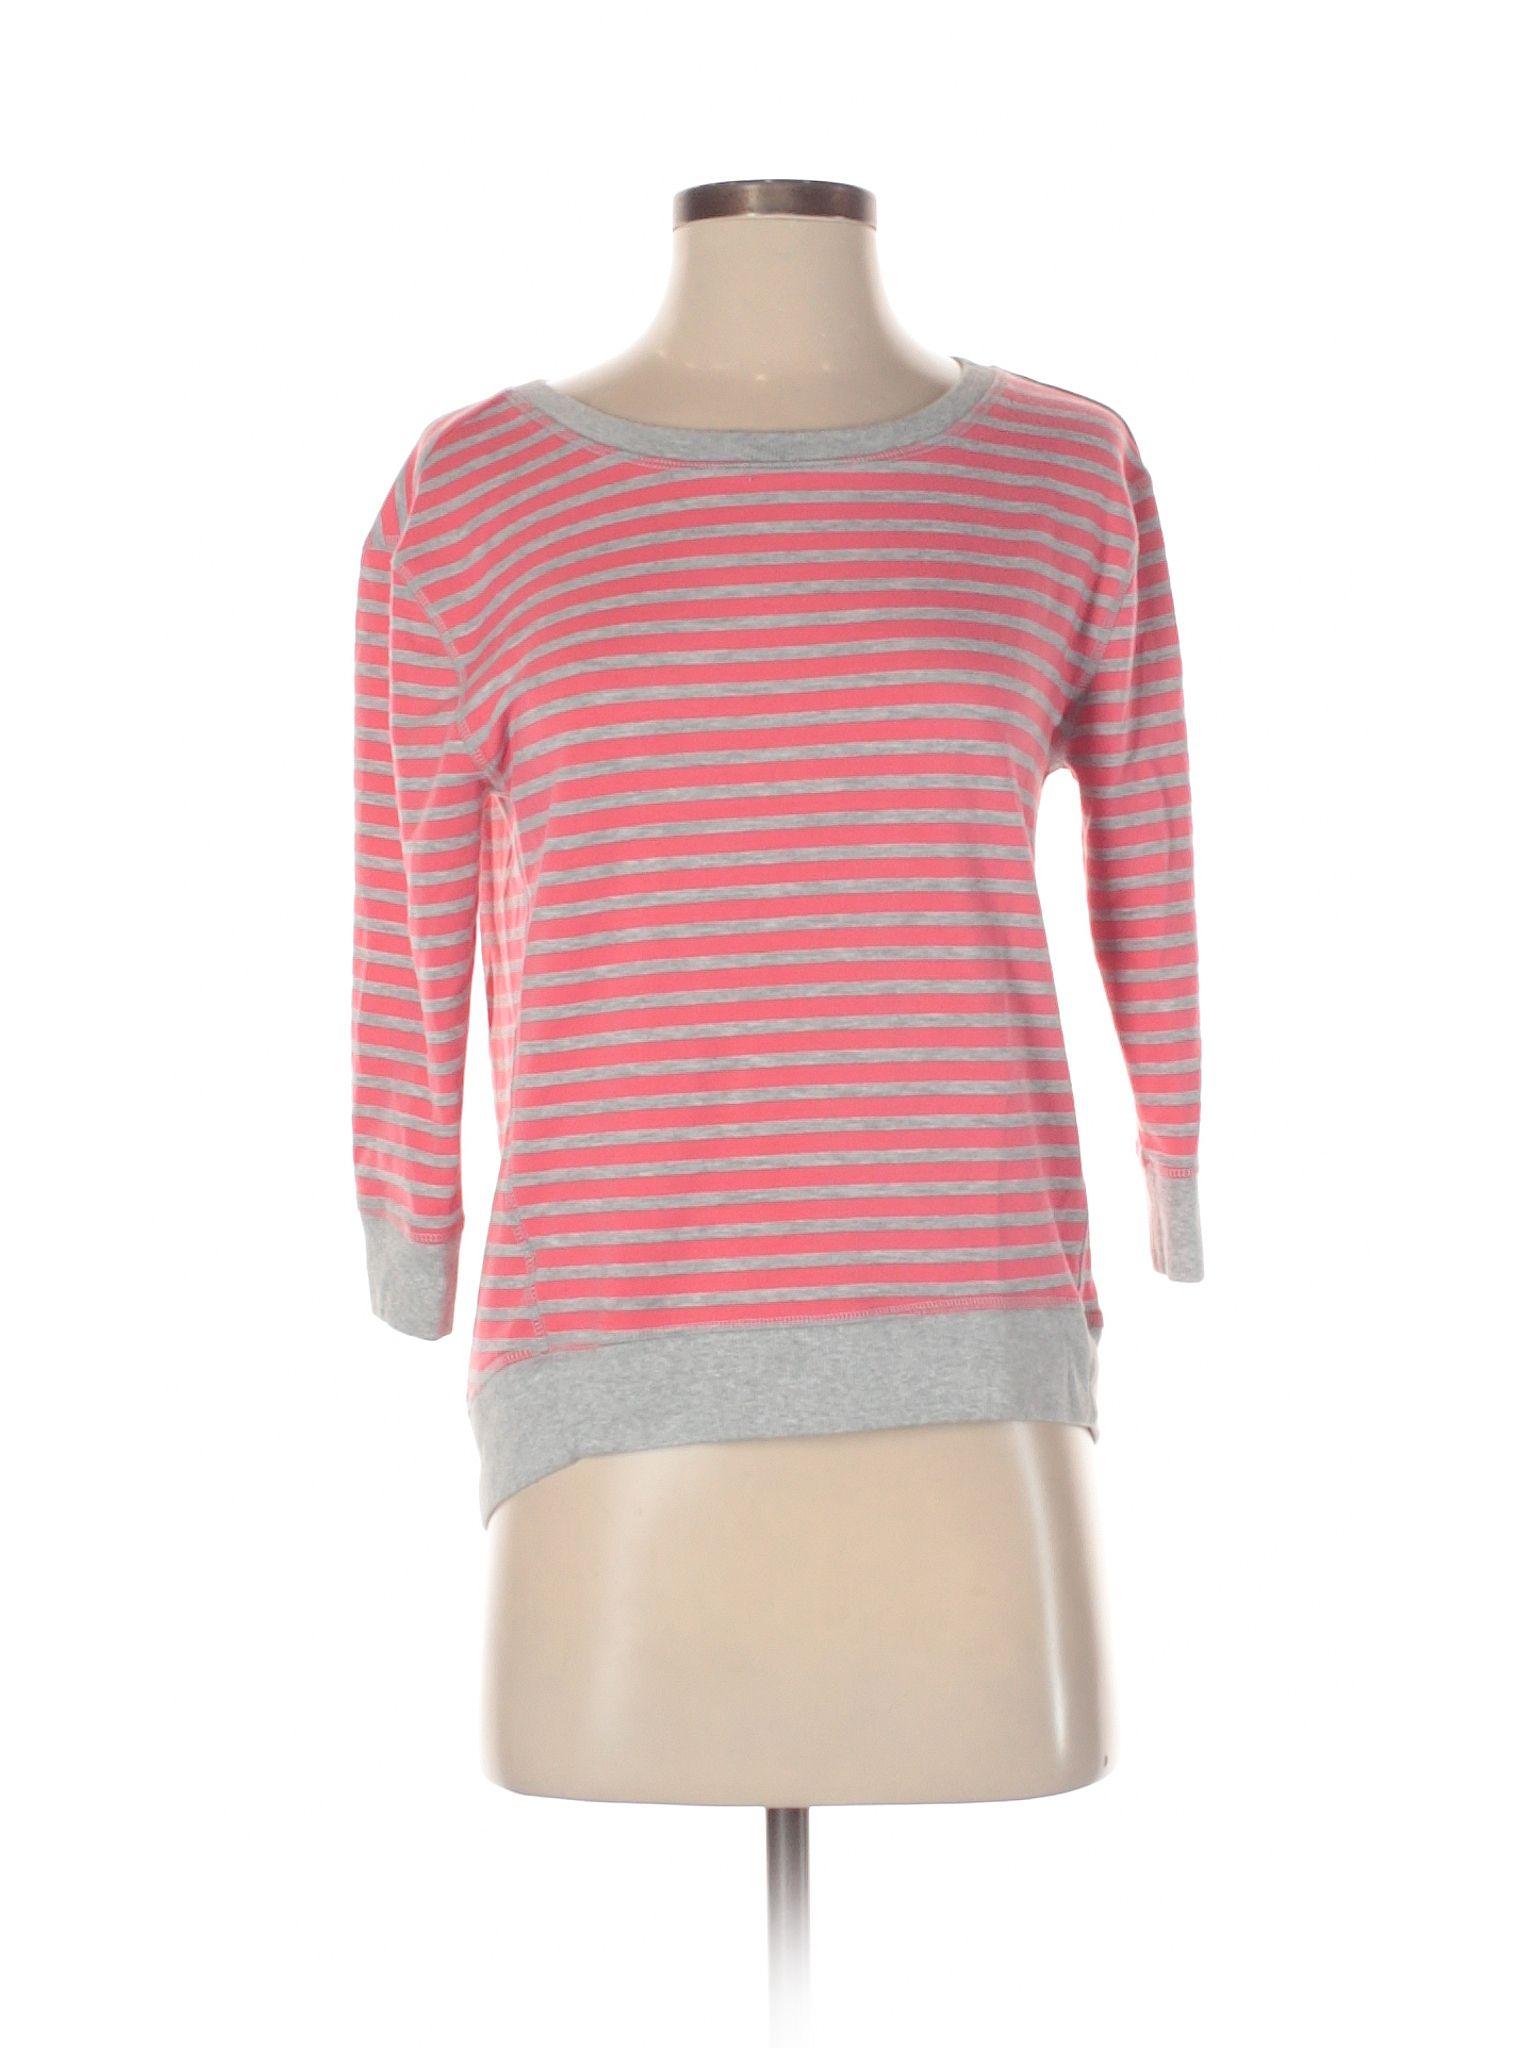 Ann Taylor Loft Sweatshirt Size 400 Coral Womens Clothing